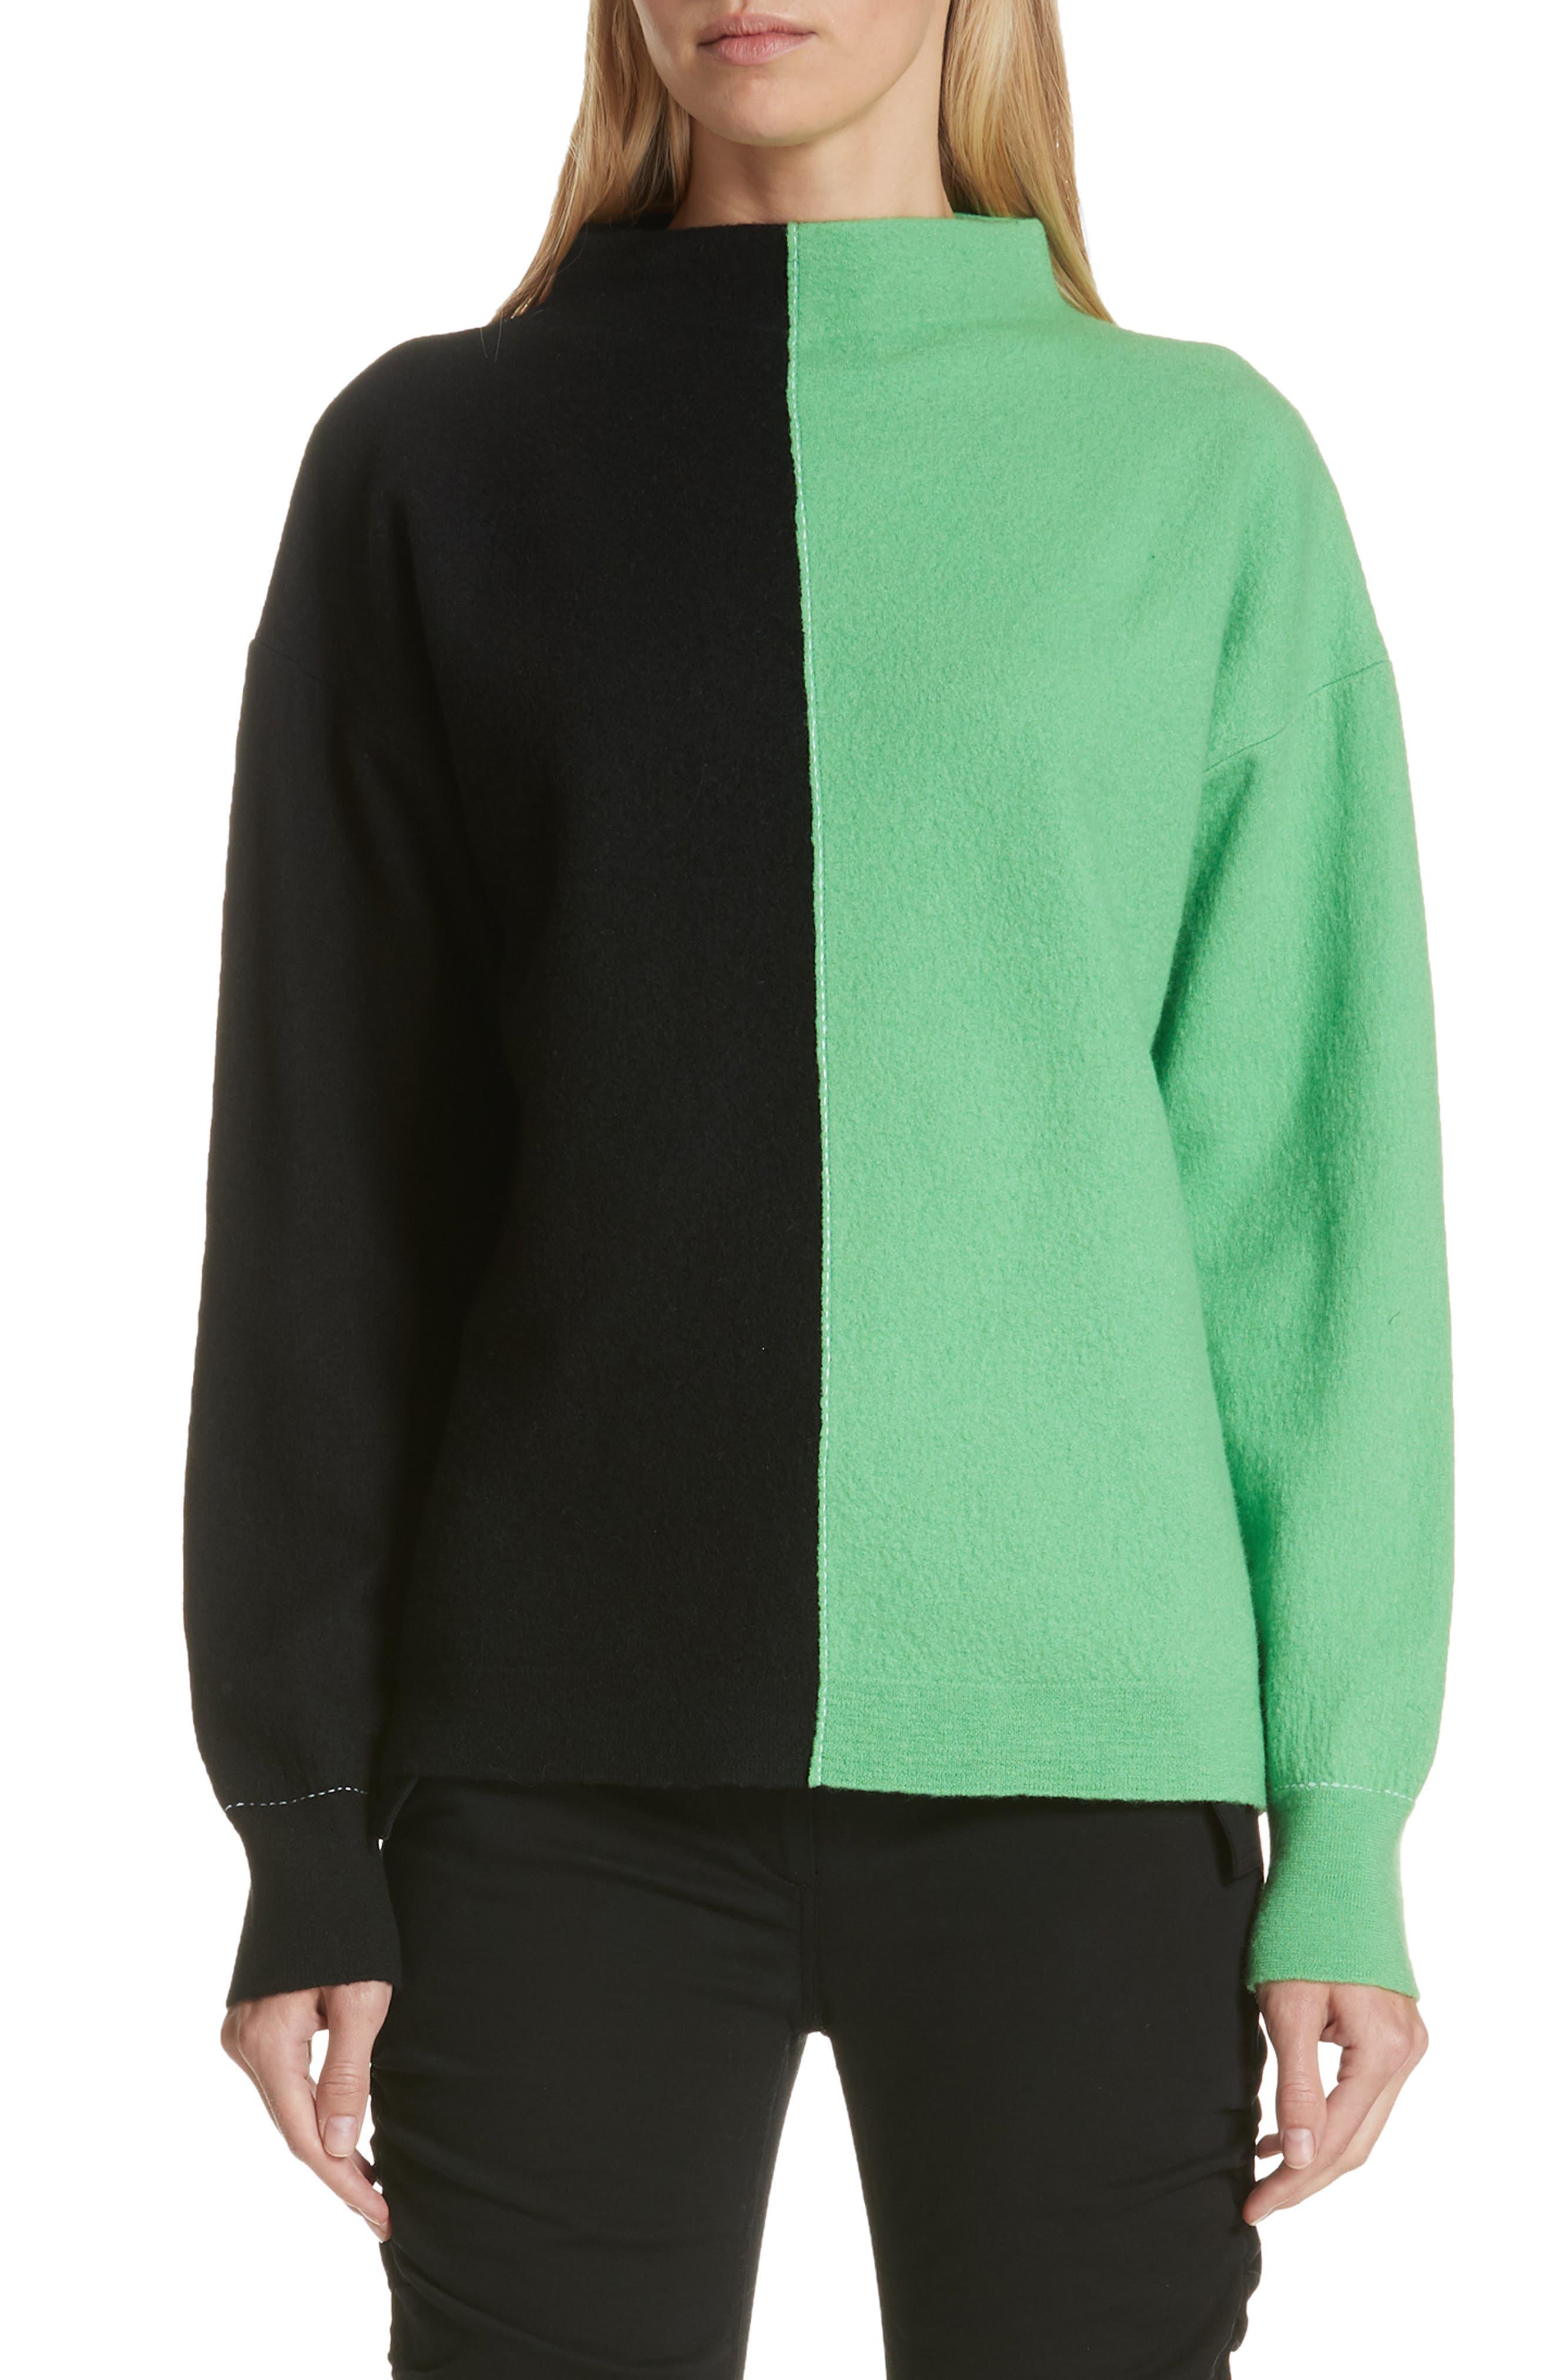 Bicolor Boiled Wool Sweater,                             Main thumbnail 1, color,                             BLACK/ GREEN